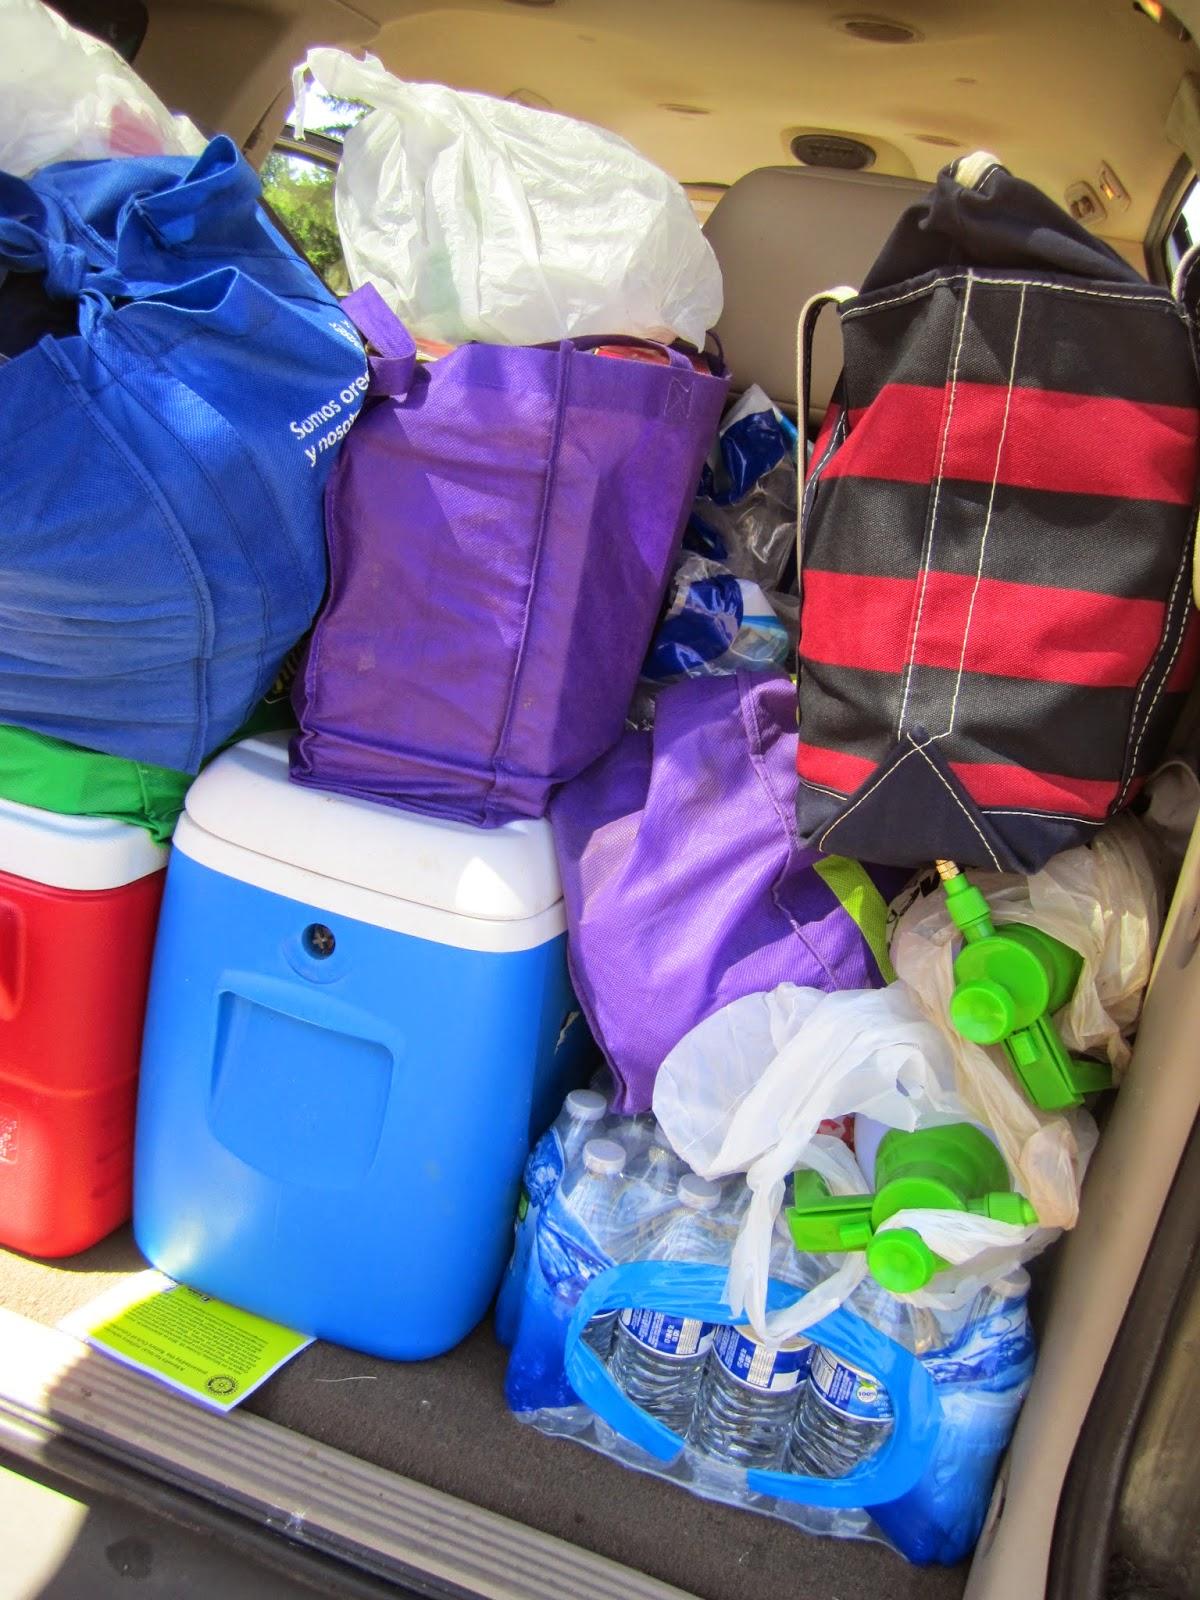 Portland to Coast van supplies